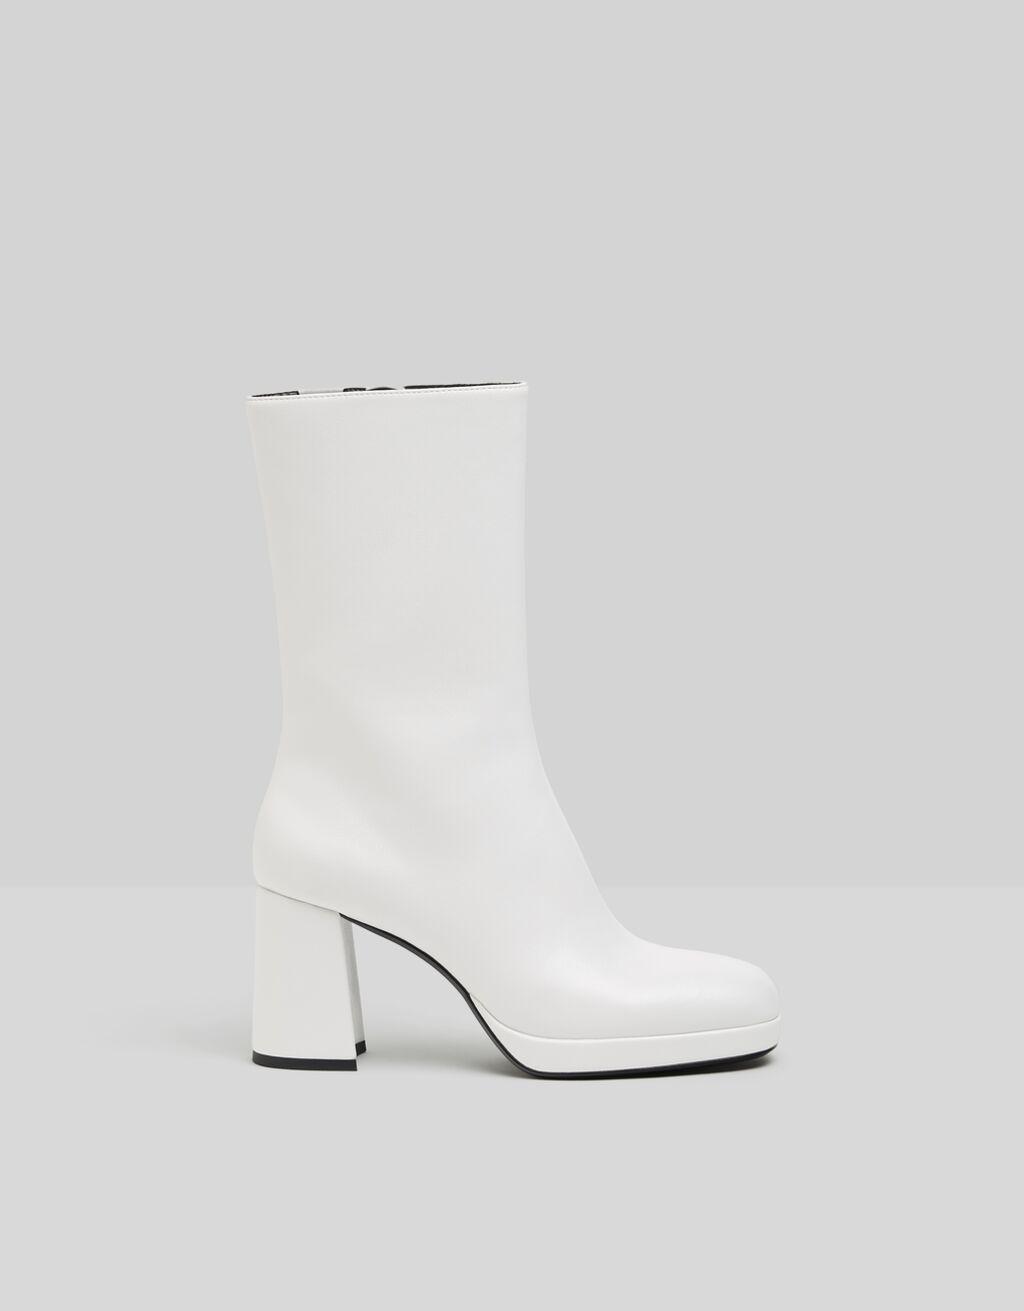 high heeled platform ankle boots